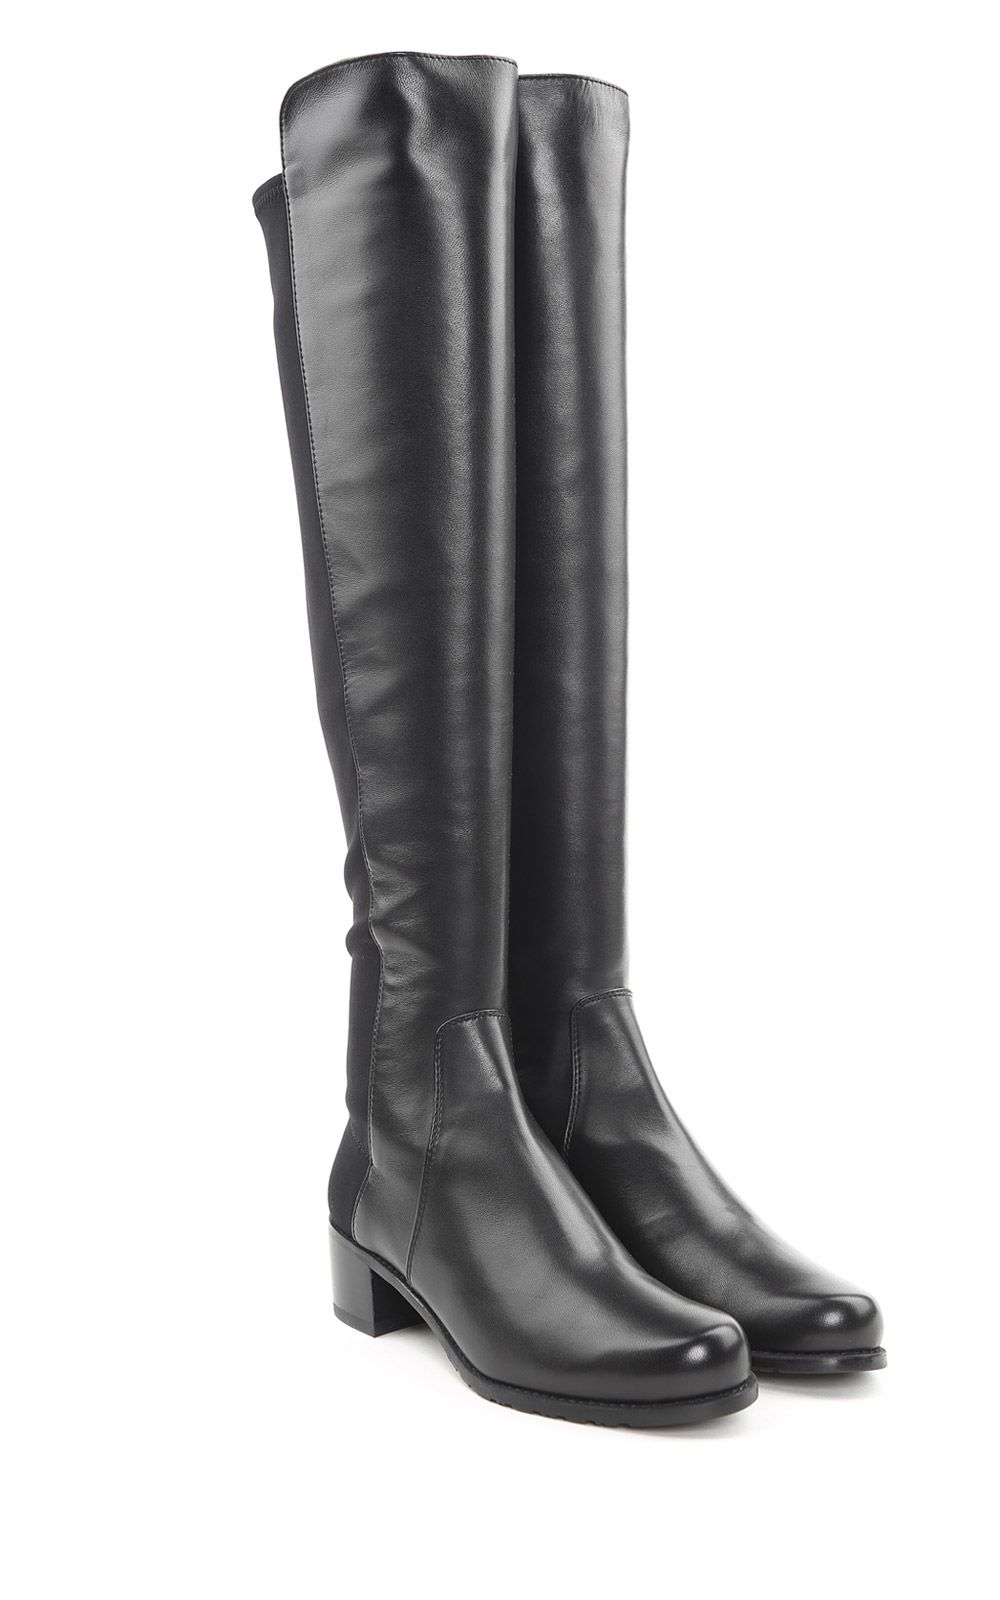 Stuart Weitzman Reserve Elastic-back Suede Boots